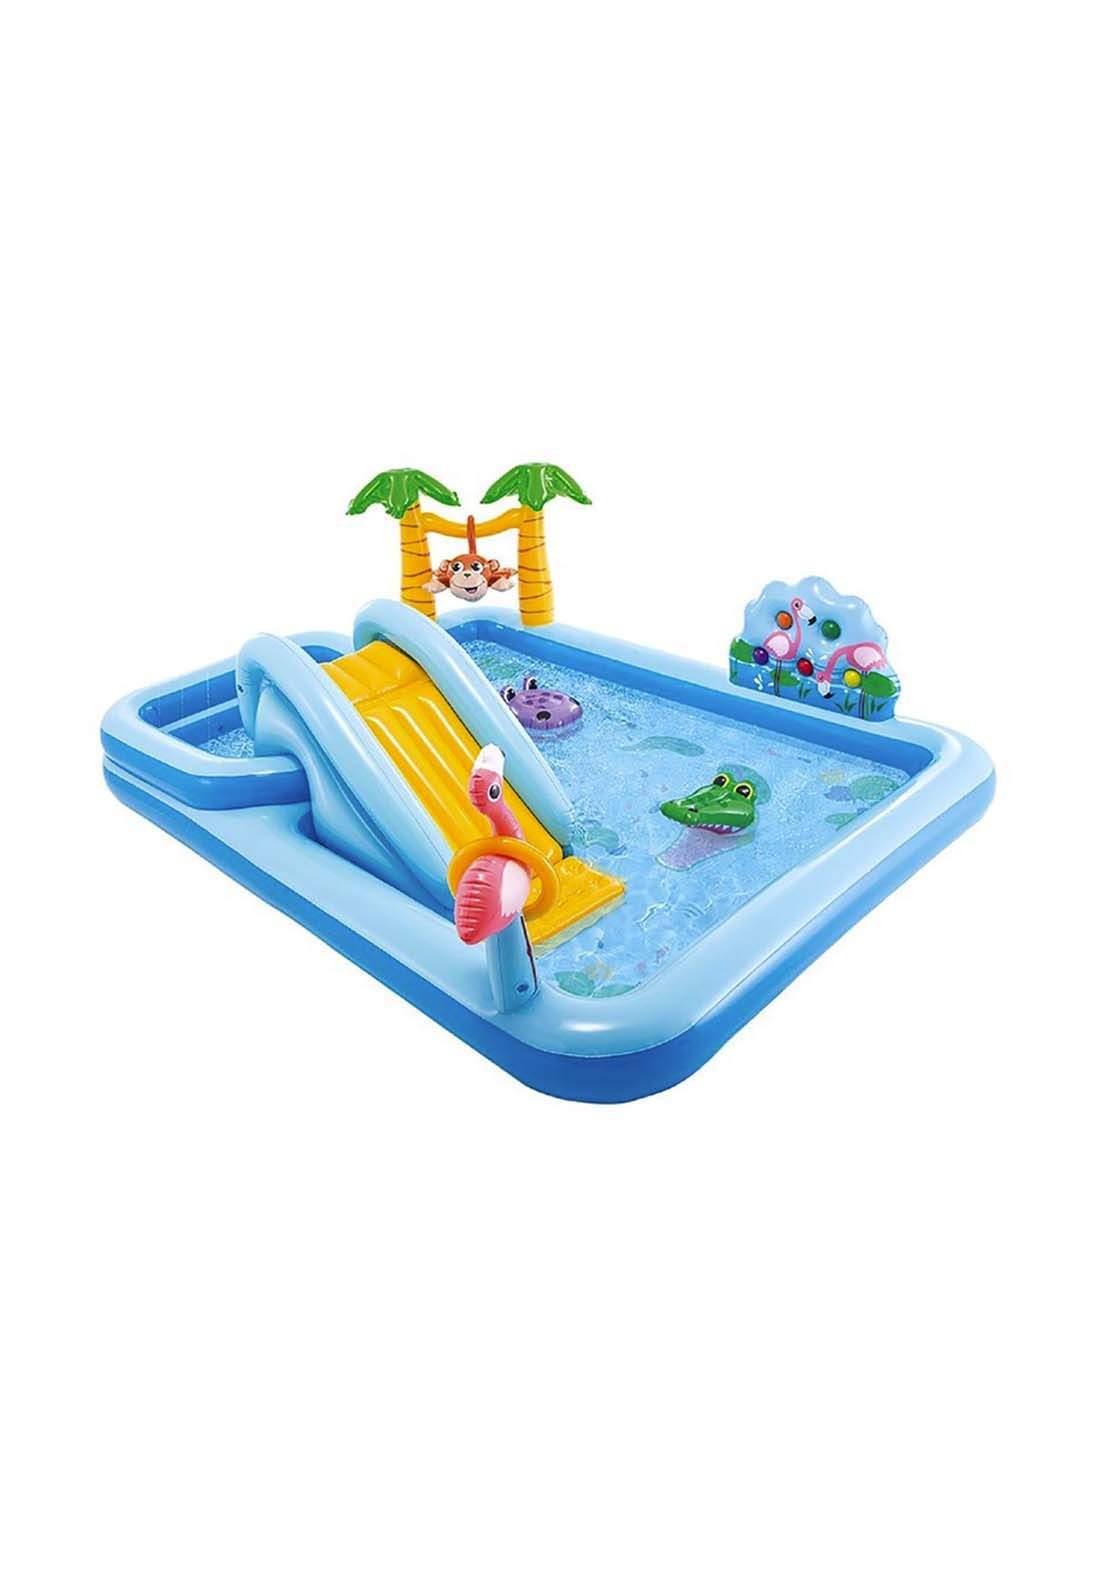 Intex 57161NP Jungle Adventure Play Center  مسبح